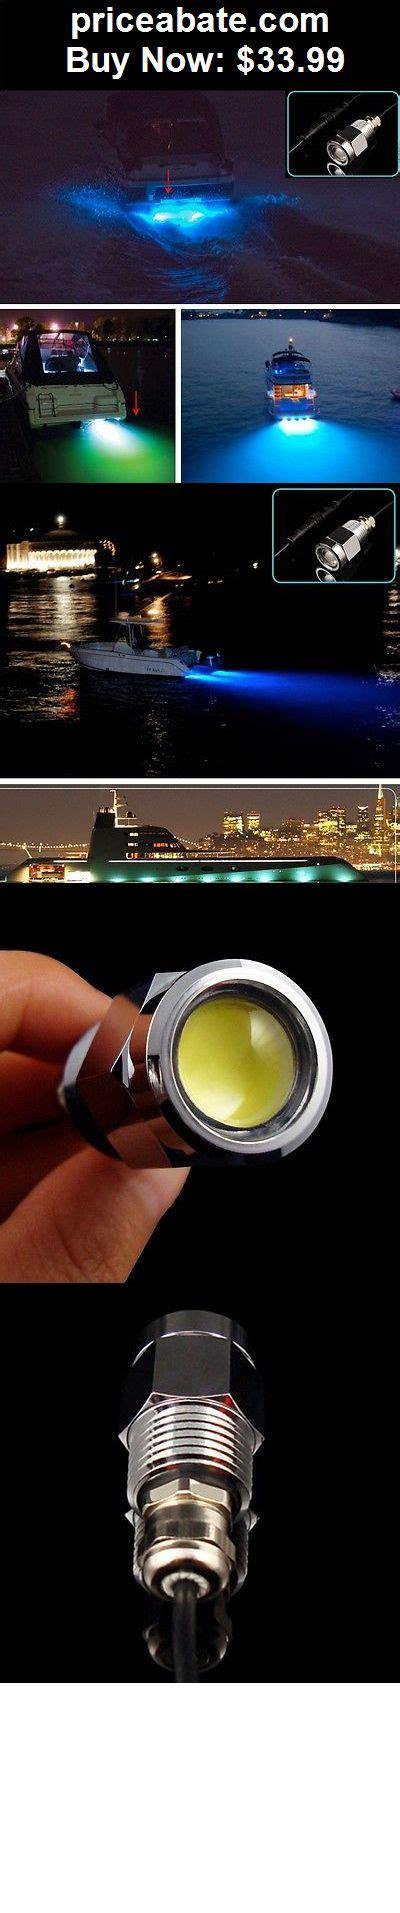 Diy Boat Drain Plug Led Light by Boat Parts Blue 6 Led 1 2 Quot Npt Underwater Boat Drain Plug